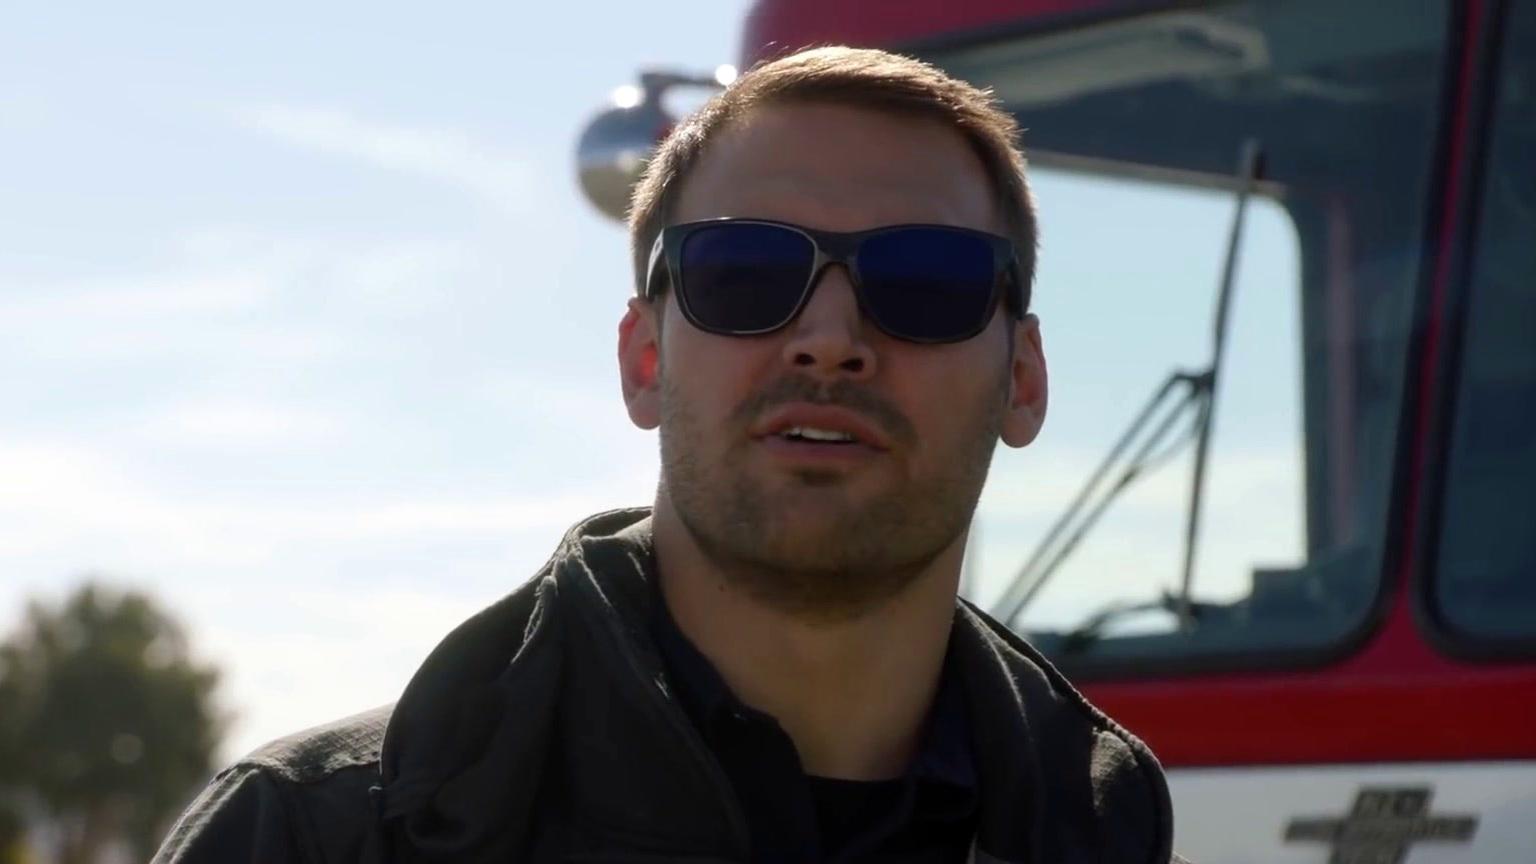 9-1-1: Skydiving Trip Gone Wrong